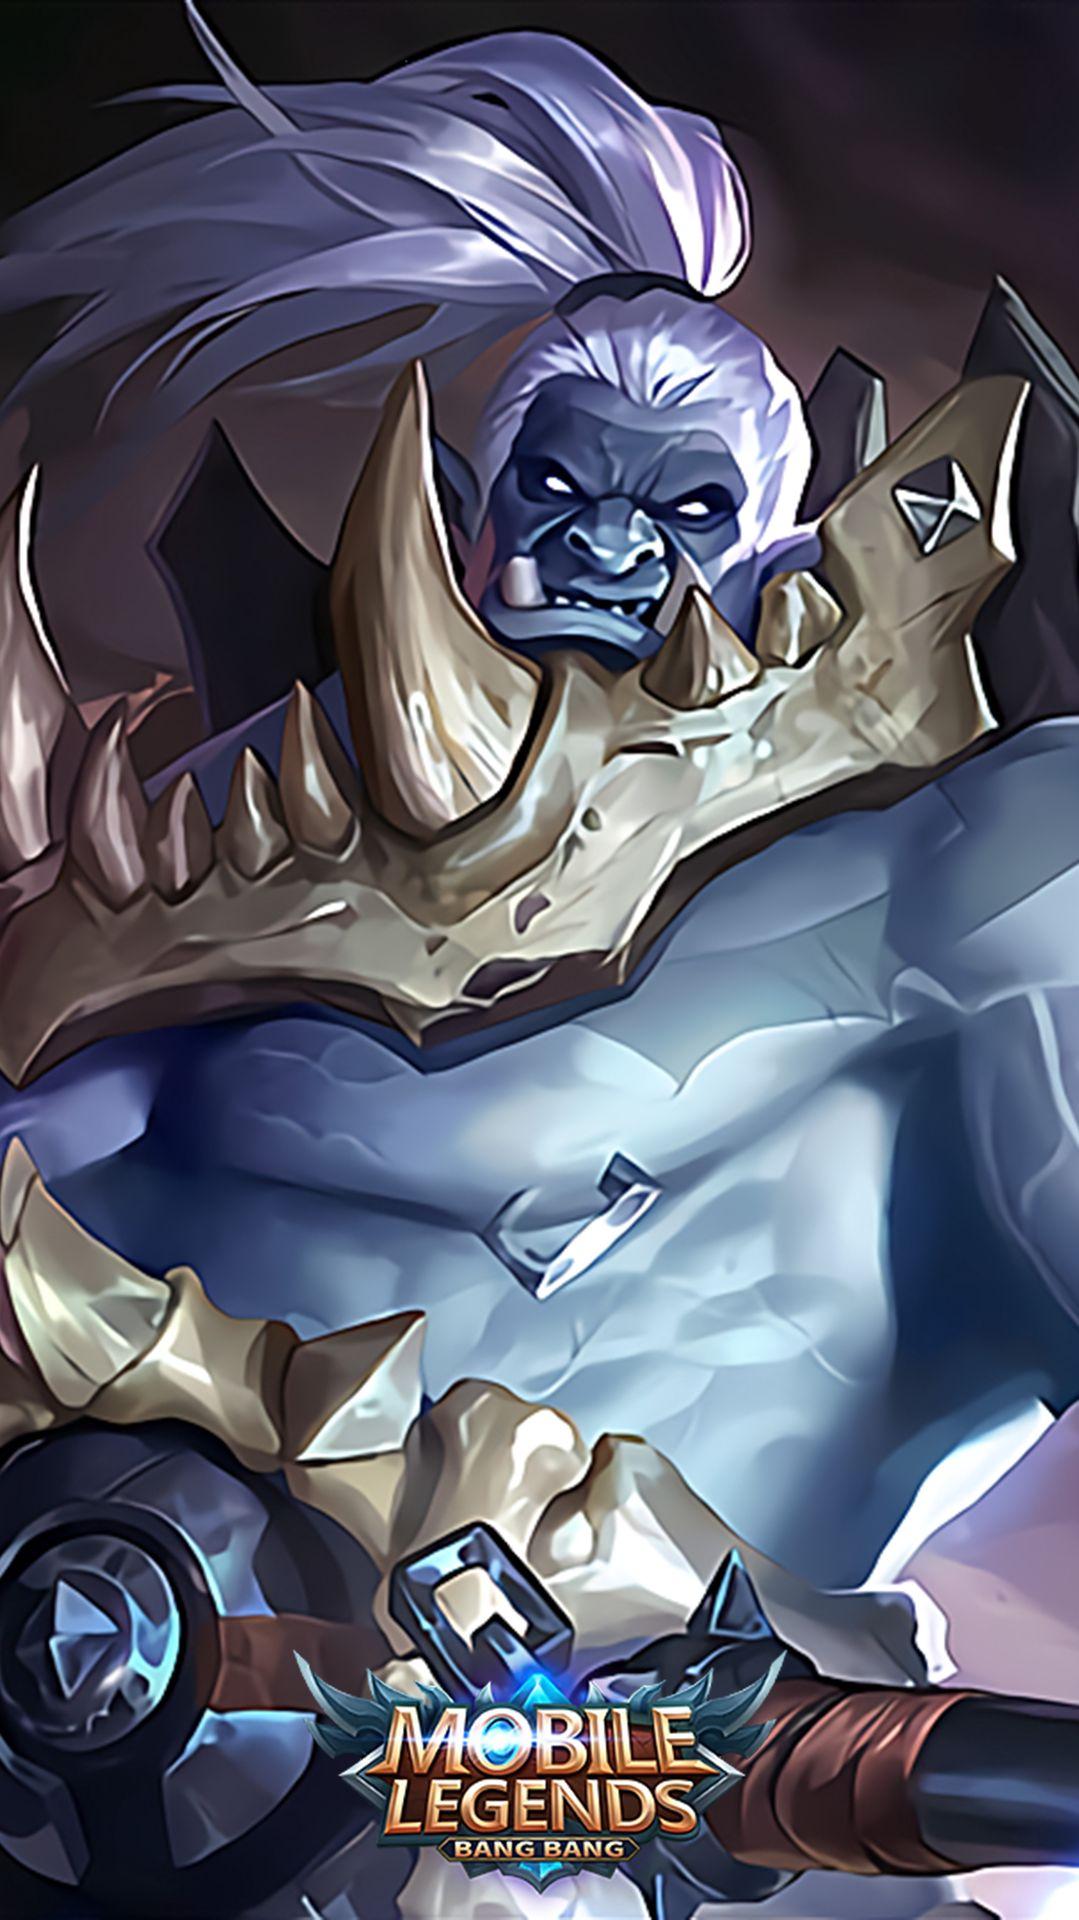 Mobile Legends Characters & Skins - ☬Power Source - Wattpad